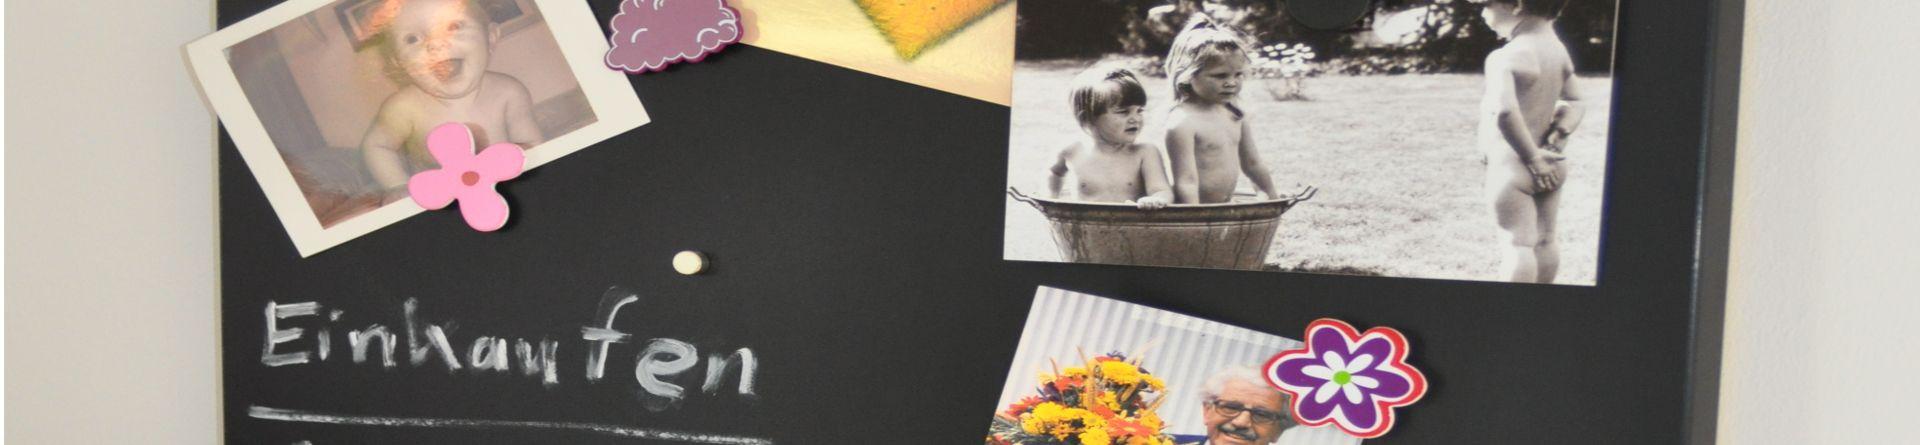 Full Size of Bank Küche Lüftungsgitter Mit Tresen Pentryküche Elektrogeräten Lüftung Apothekerschrank Outdoor Edelstahl Obi Einbauküche Musterküche Wandverkleidung Wohnzimmer Magnetische Kreidetafel Küche